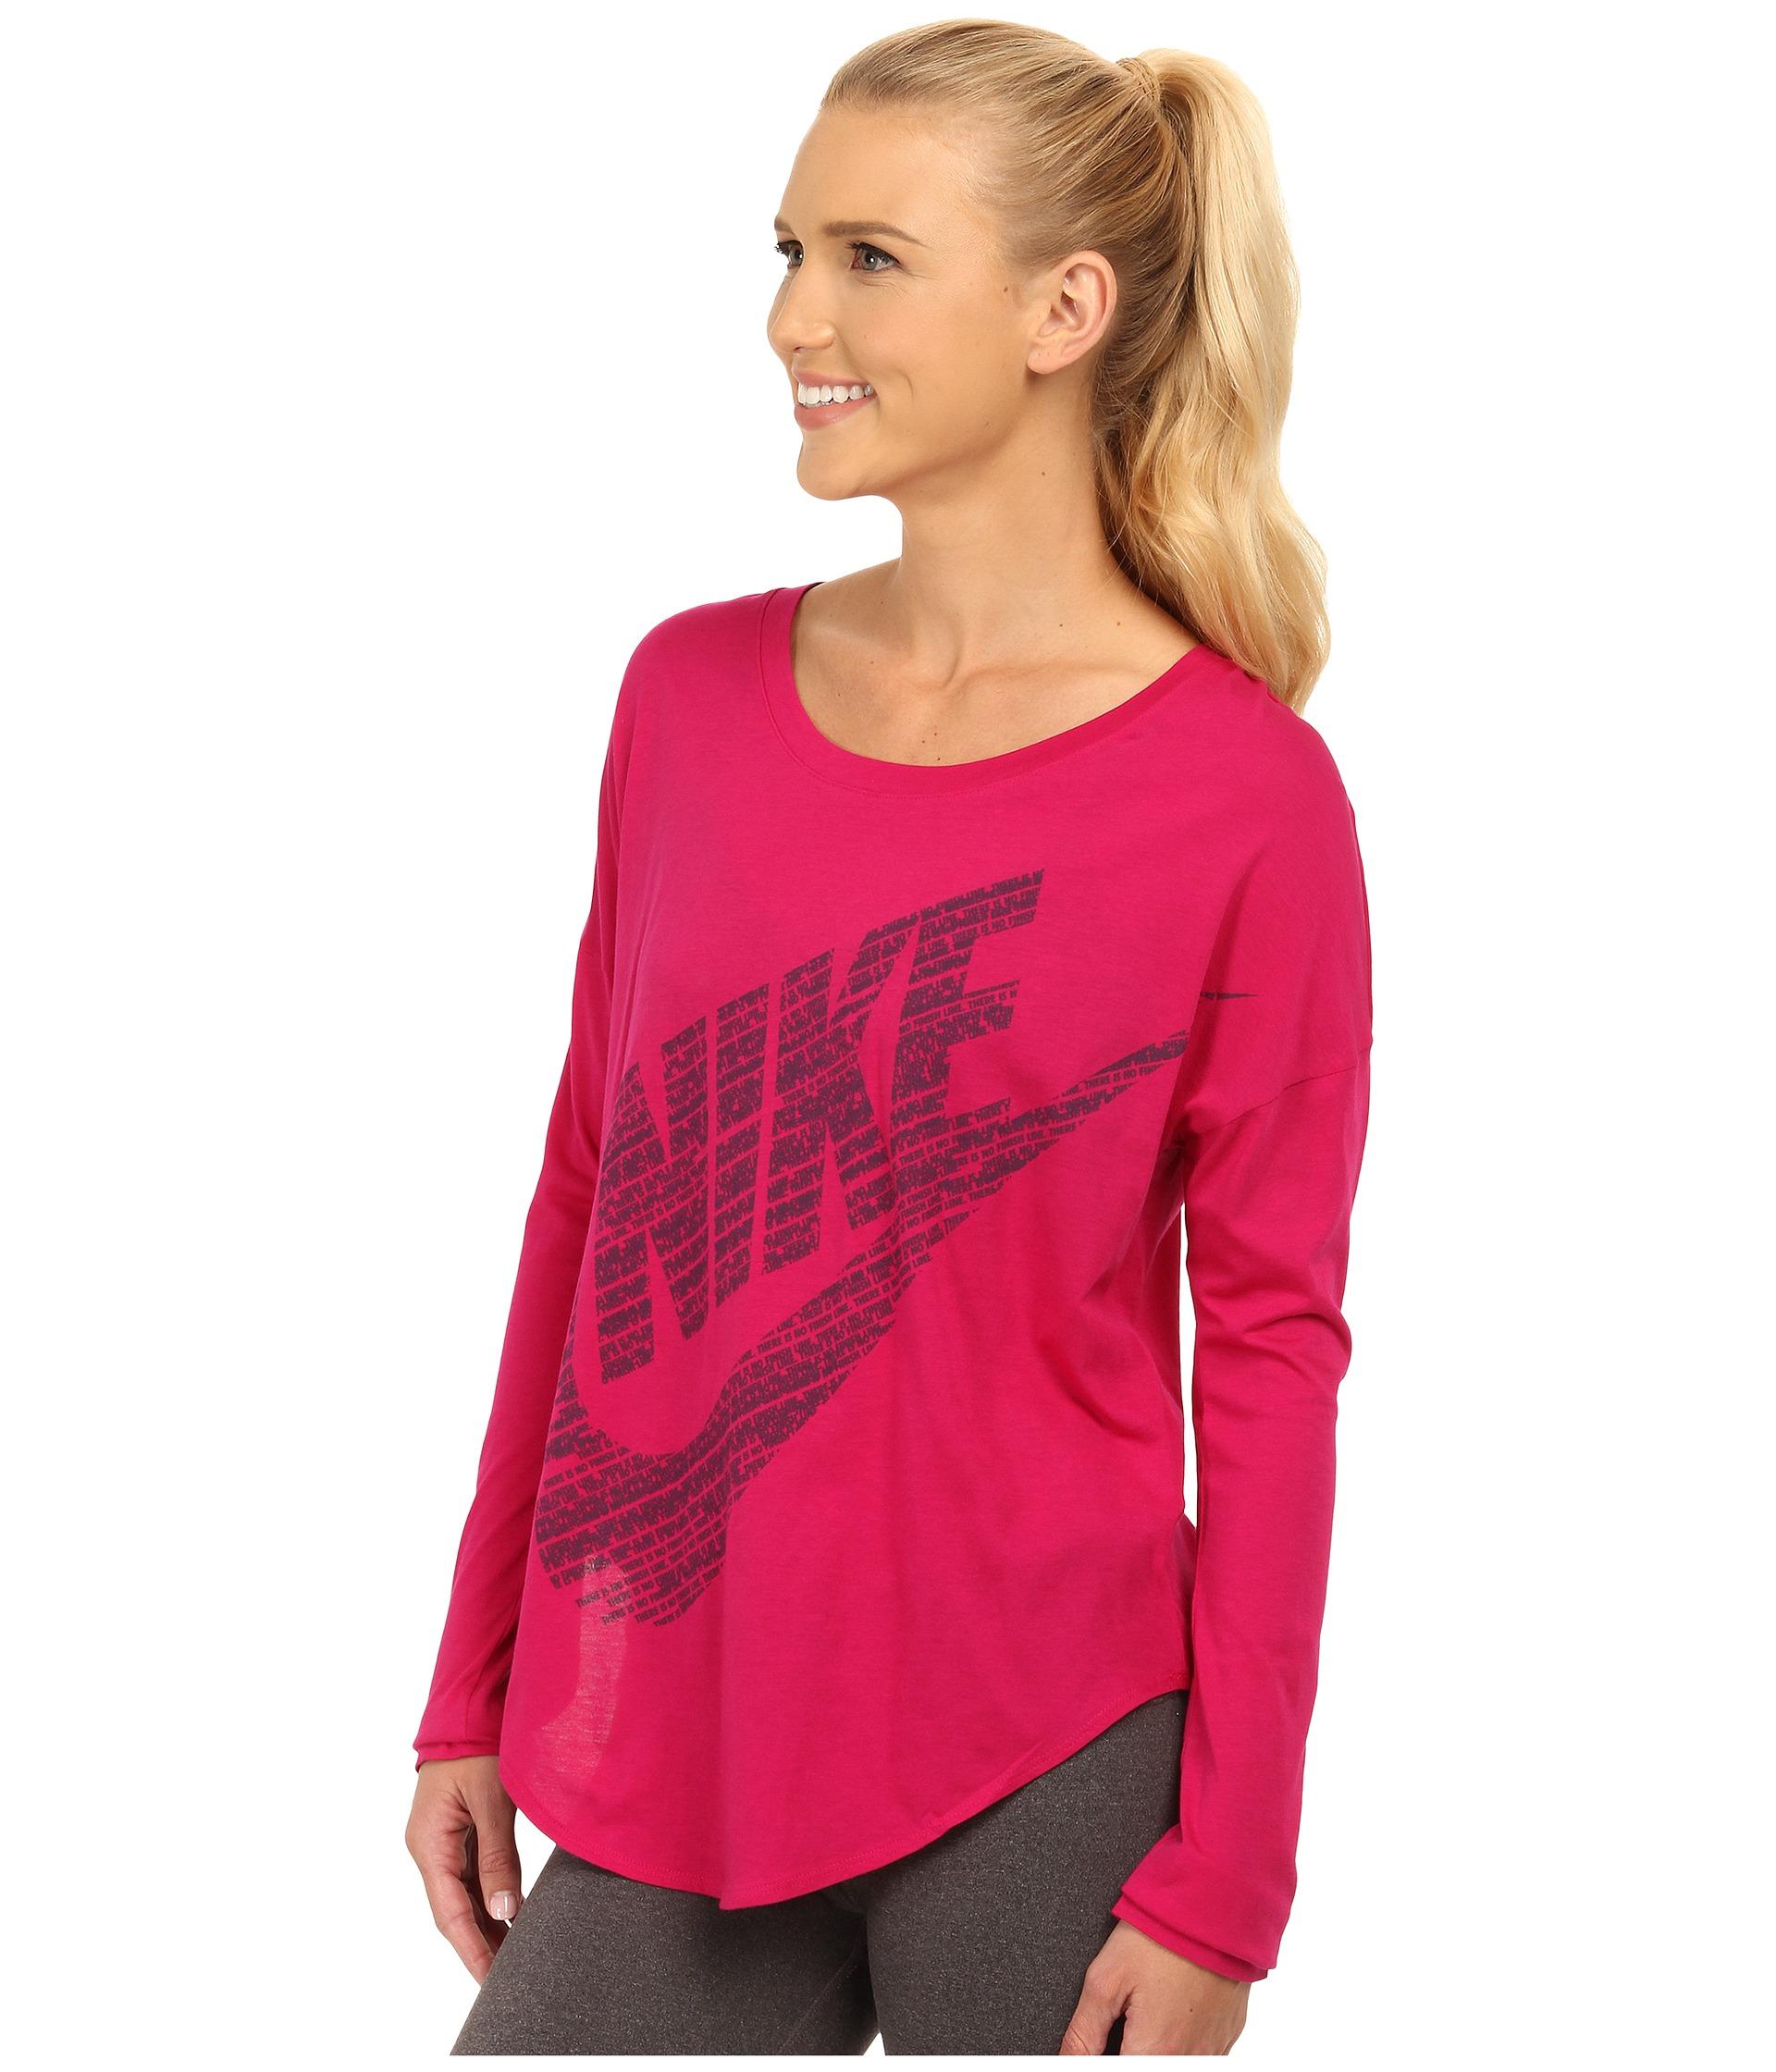 eec49966 Nike Signal Long Sleeve Tee in Pink - Lyst